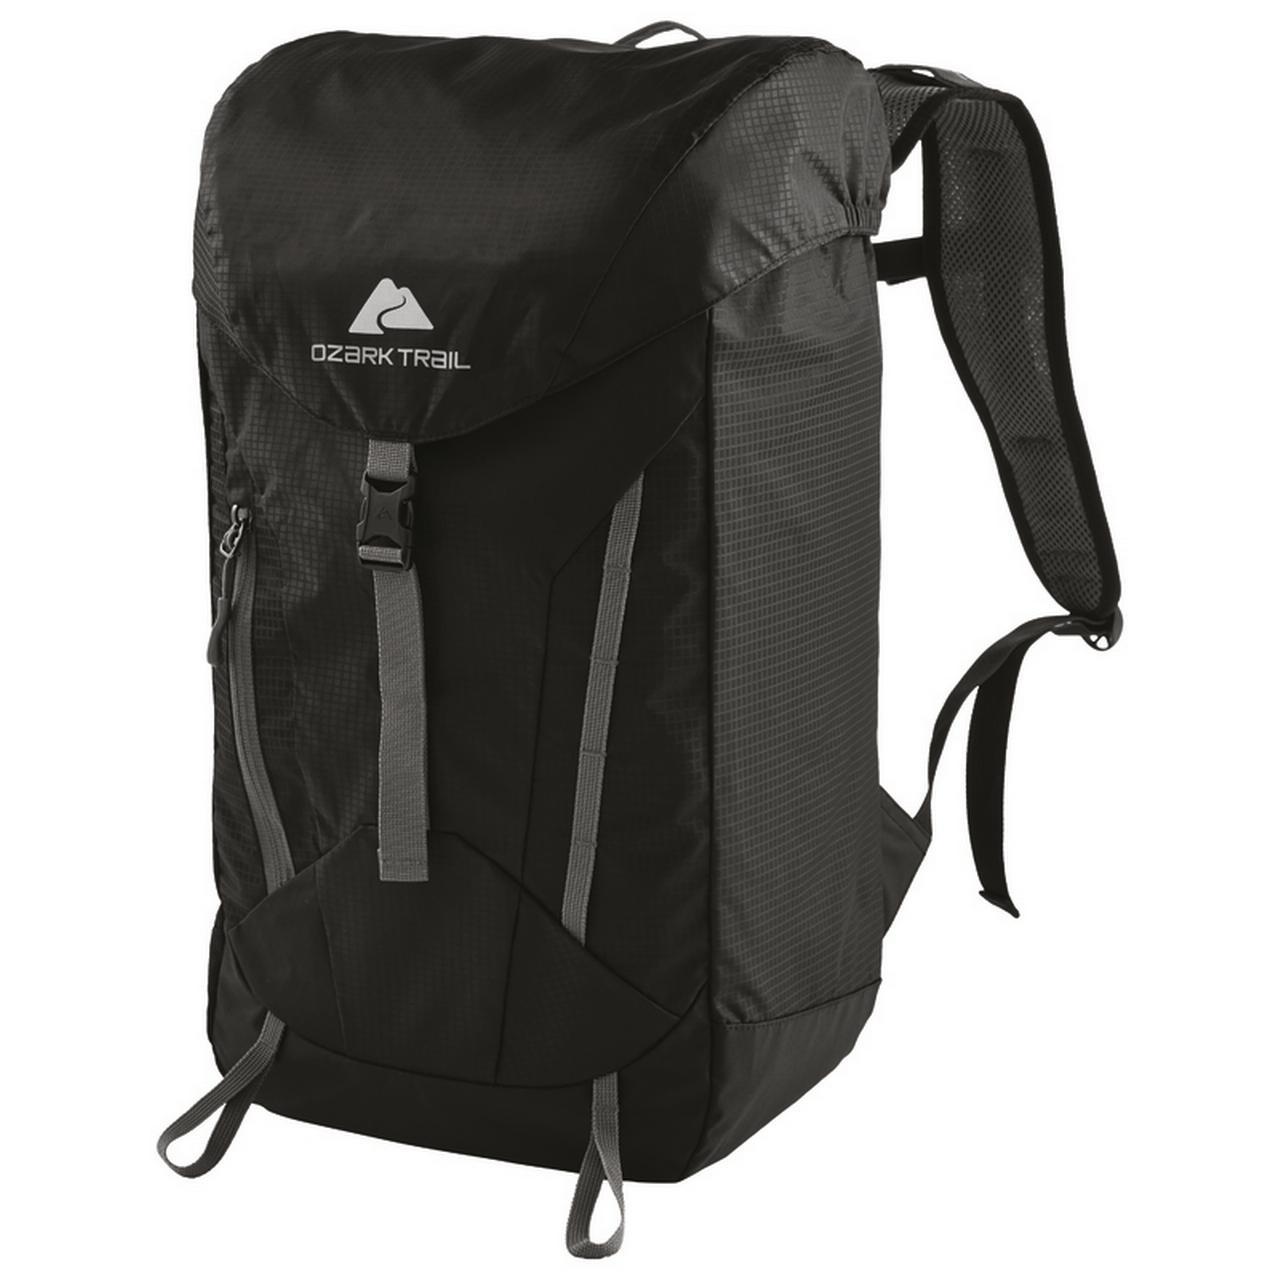 Ozark Trail 28L Atka Ultra lightweight Hydration-Compatible Backpack